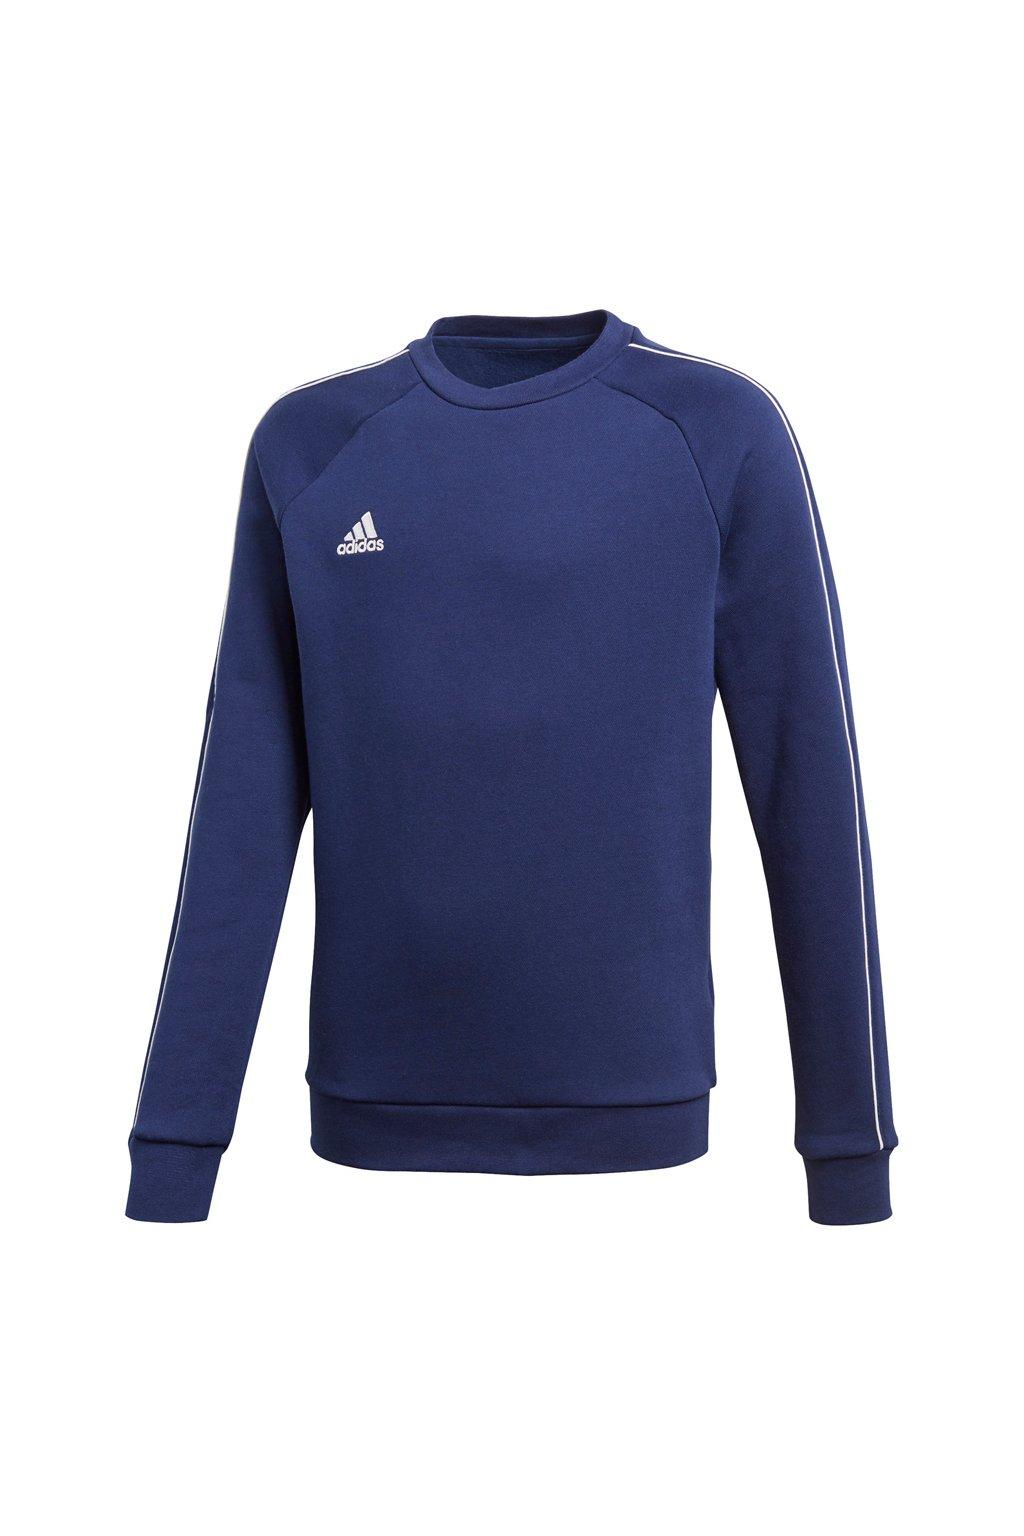 Detská mikina Adidas Core 18 Sweat Top JUNIOR námornícka modrá CV3968